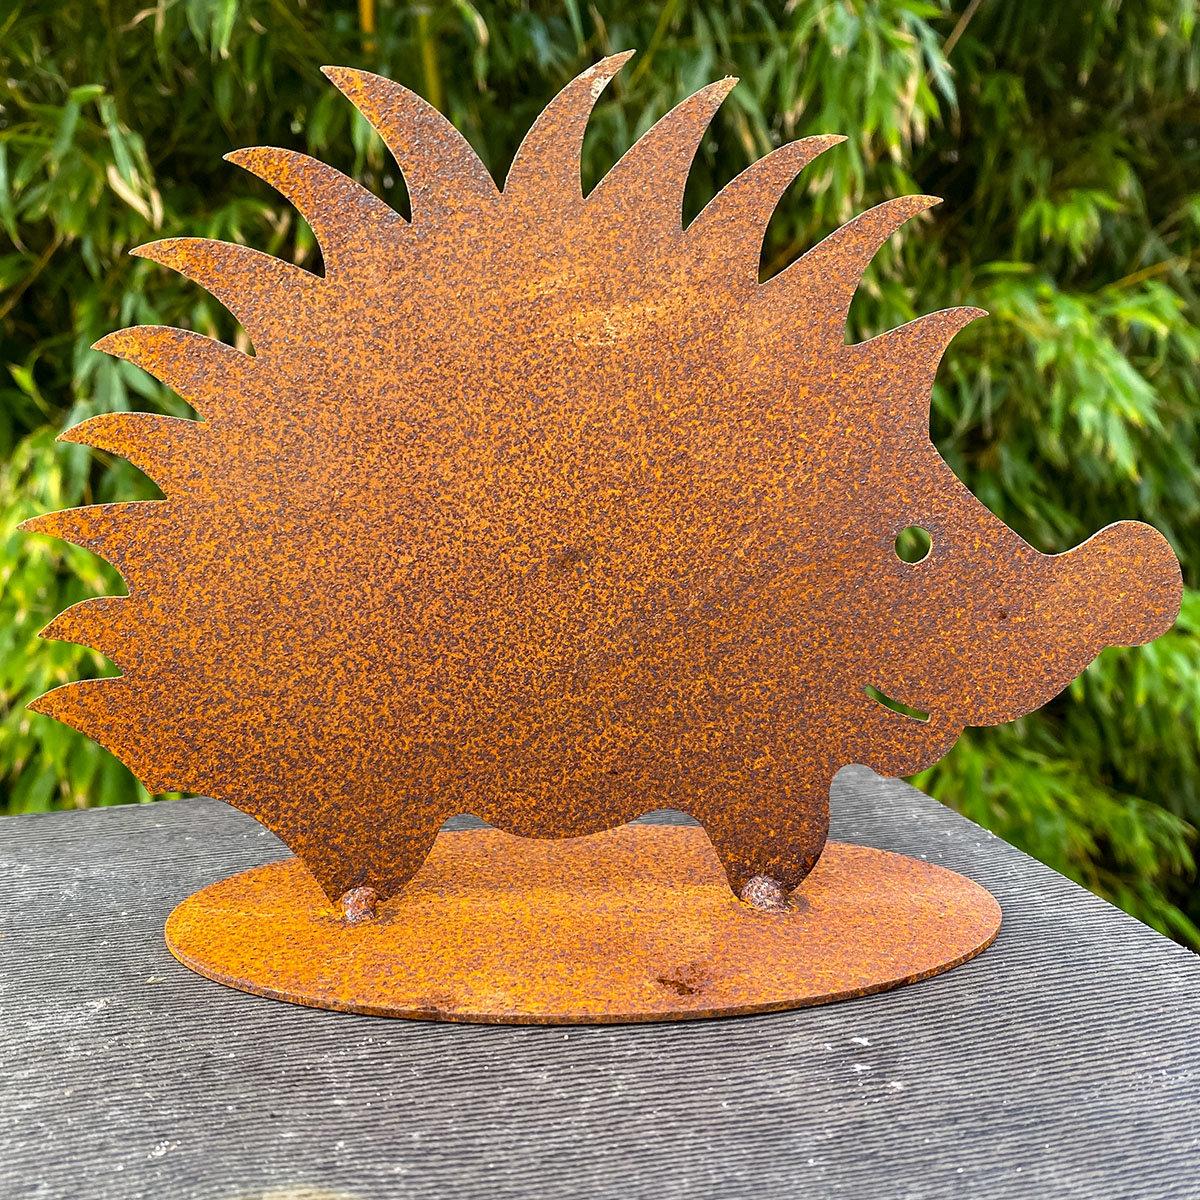 Gartenfigur Igel Max, Edelrost, 20 cm